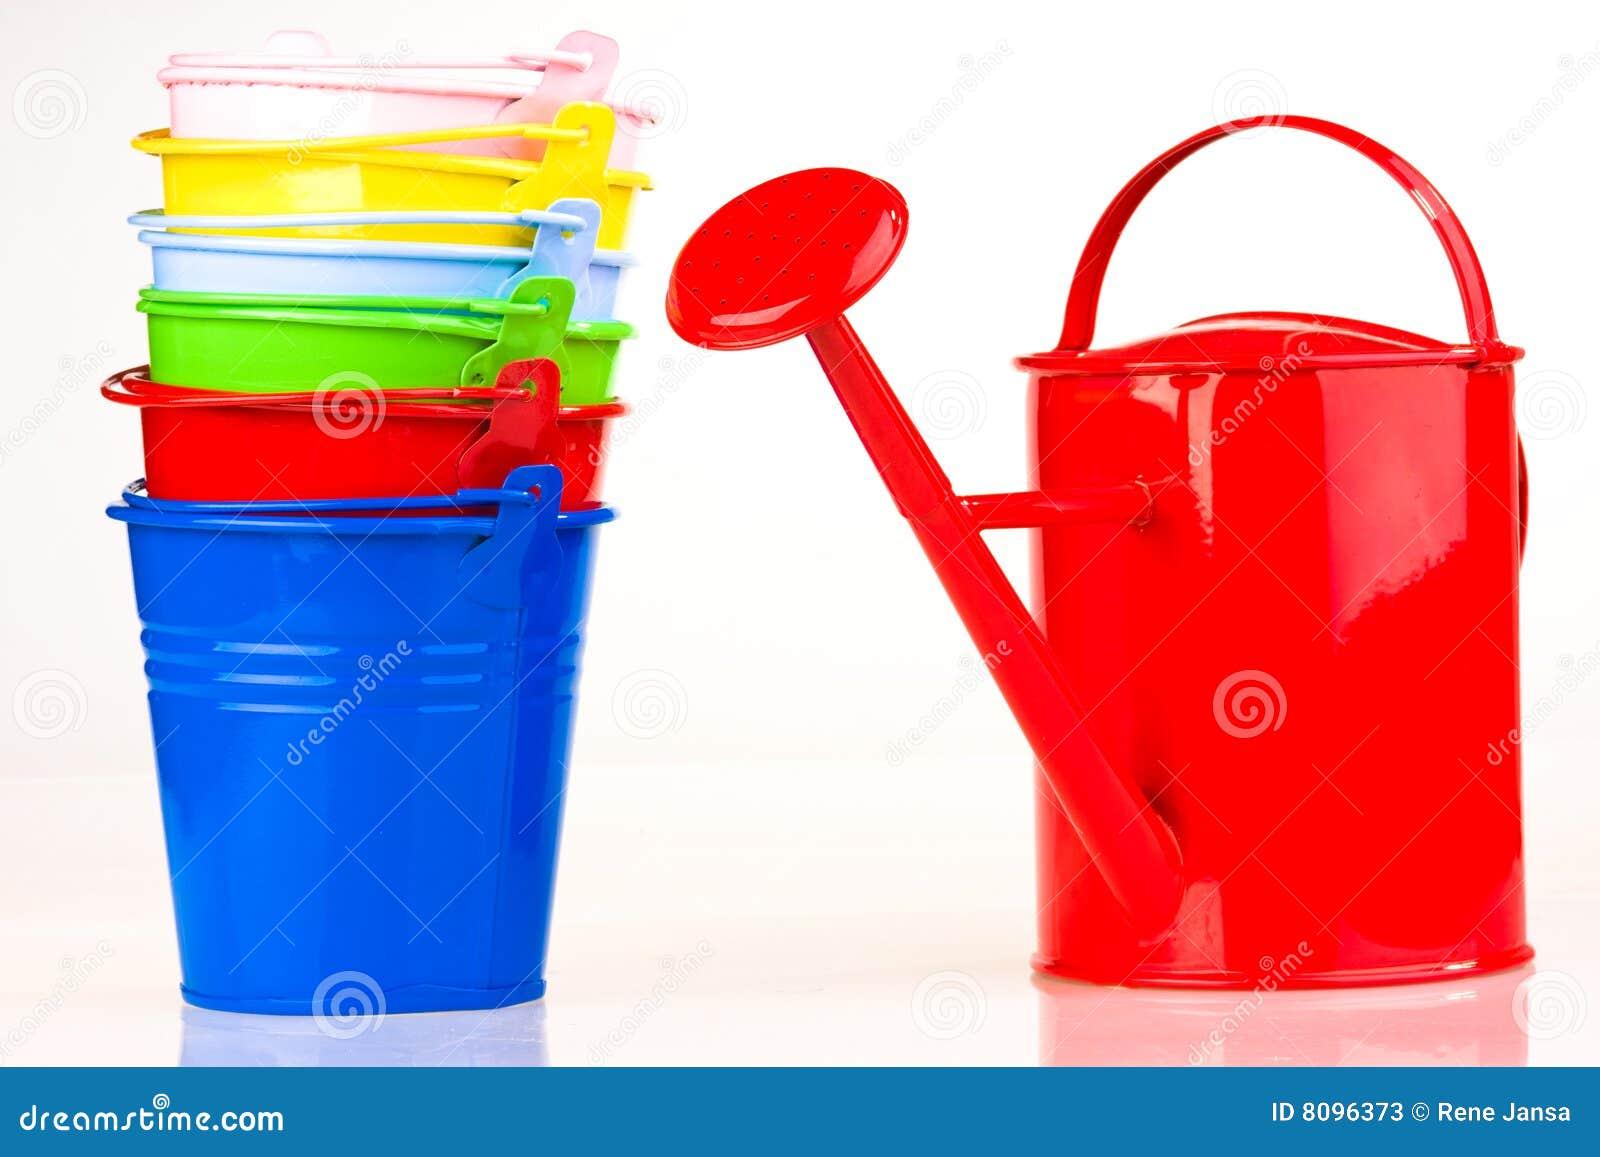 Cubetas e lata molhando coloridas